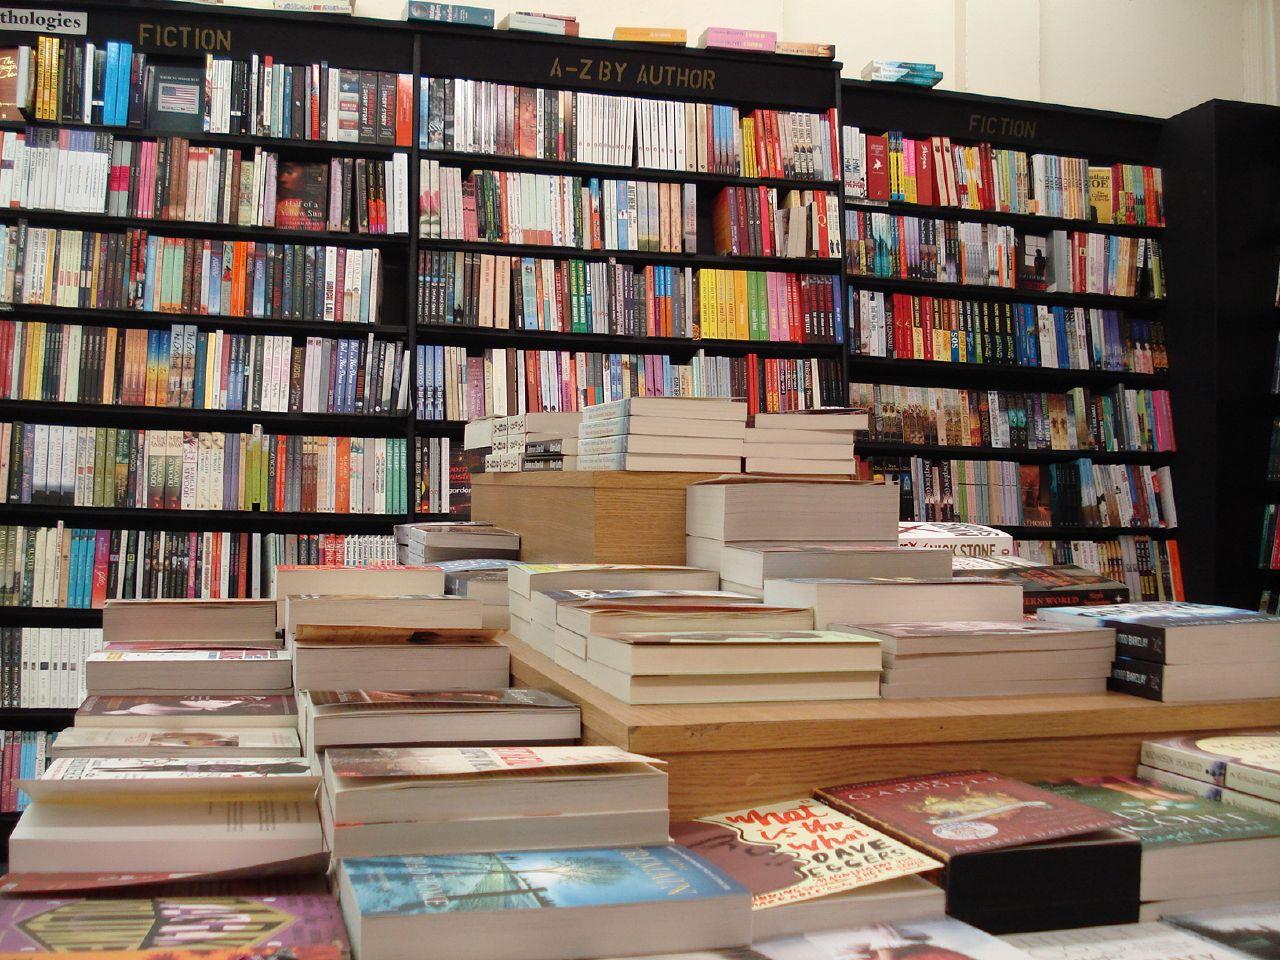 bookshop plight pop verse independent local publishing thursday super books christmas ames